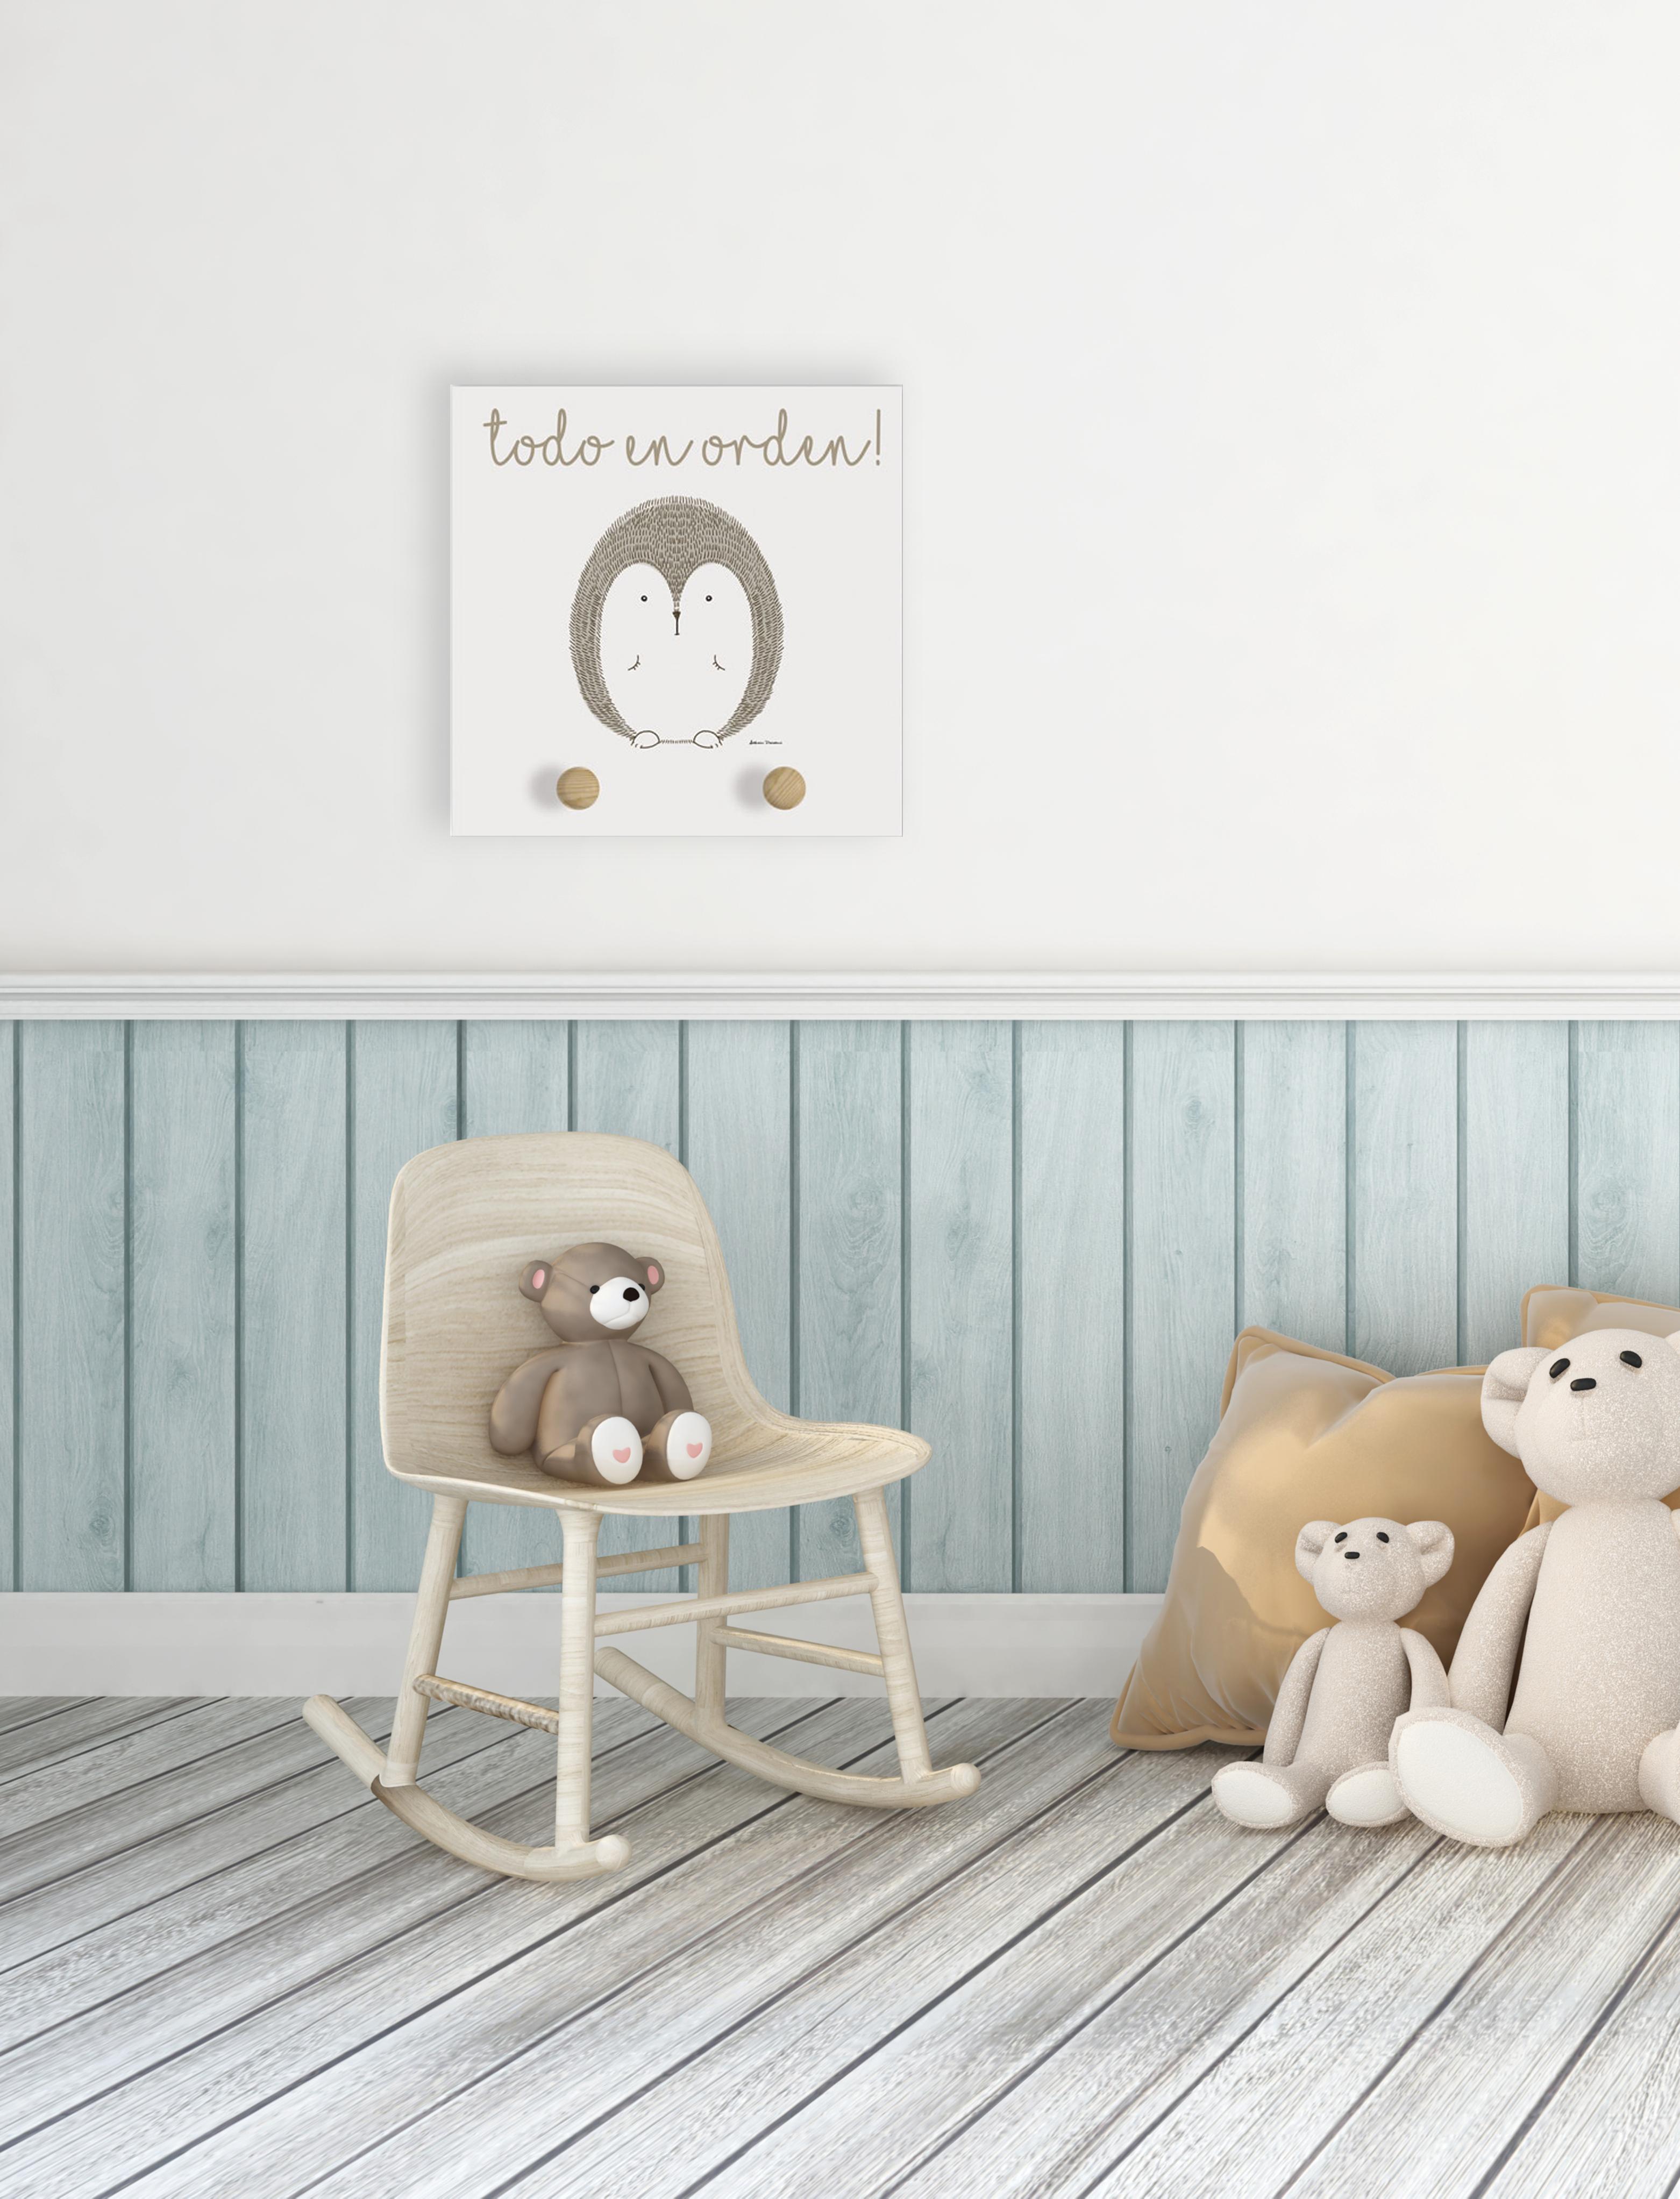 porcupine - Perchero Porcupine